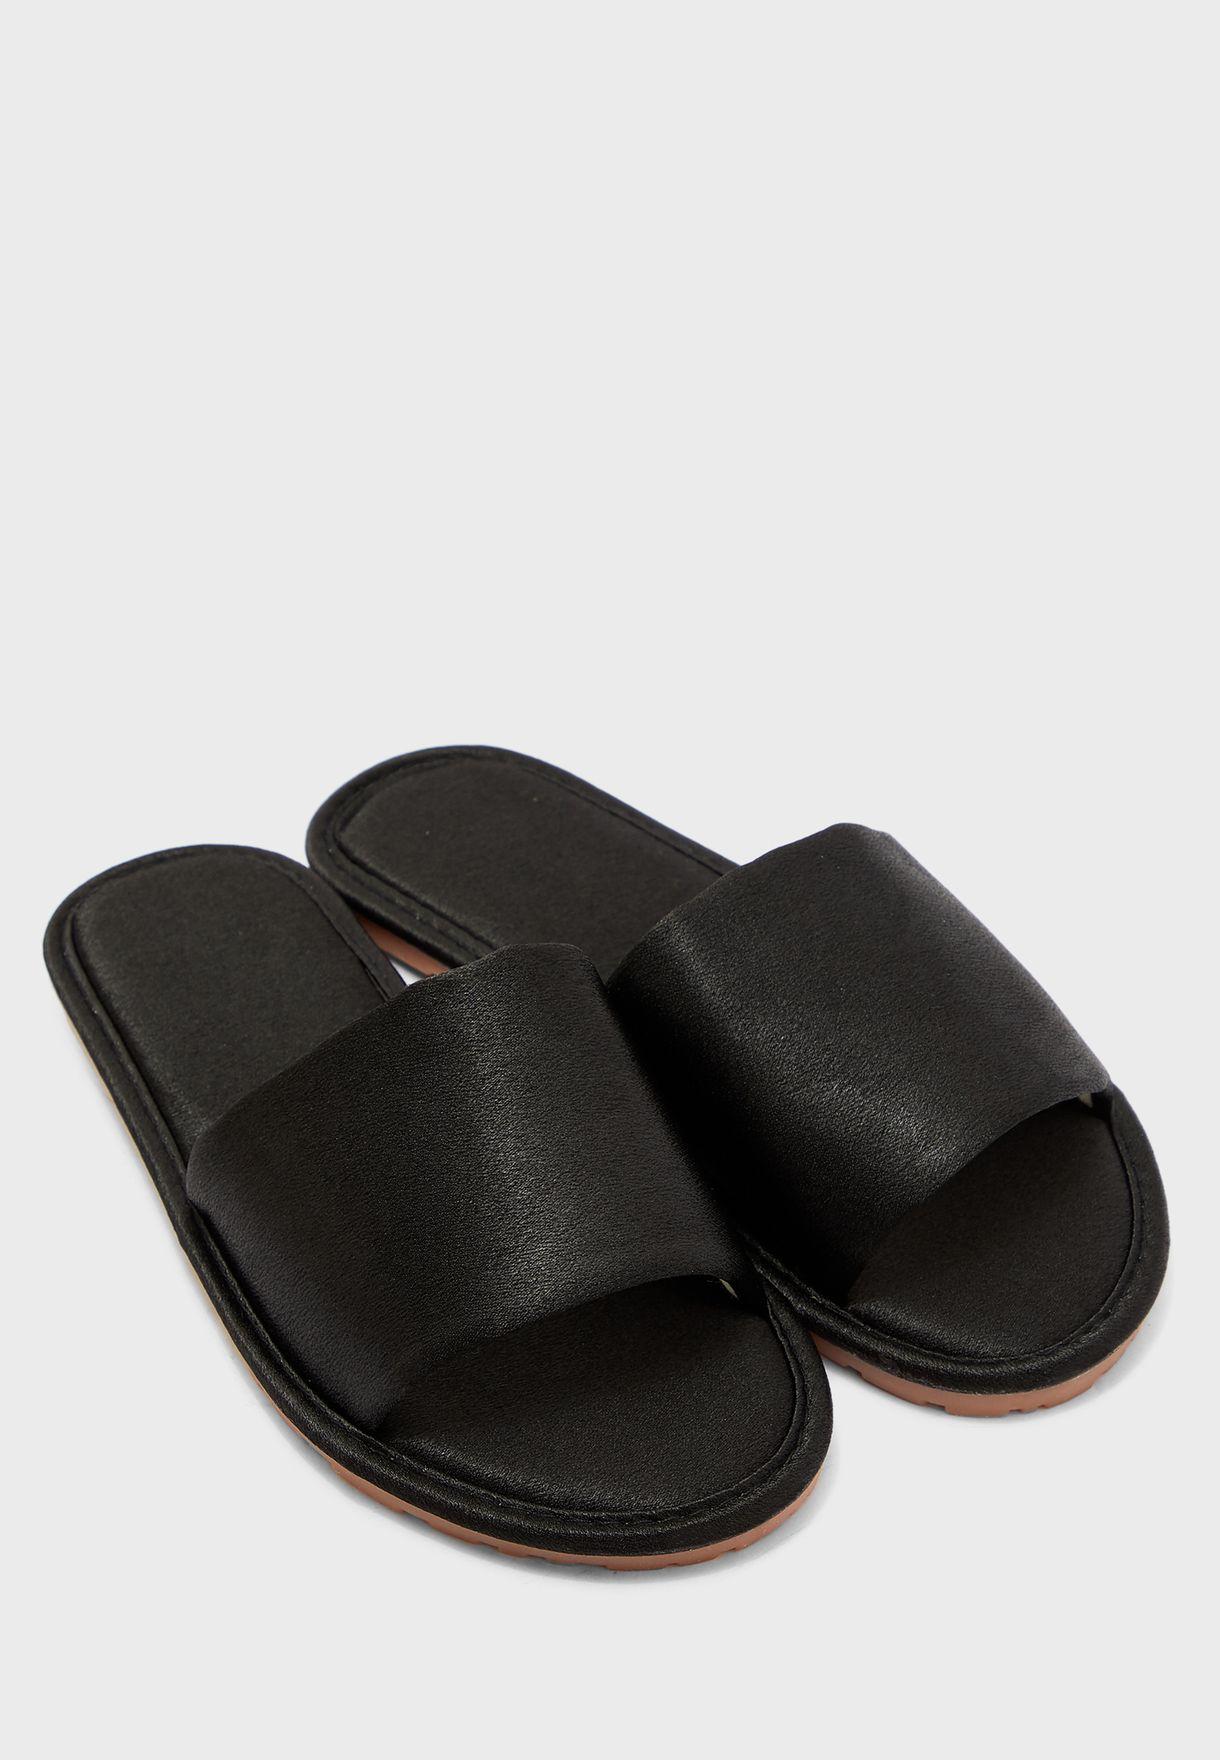 Satin Slippers